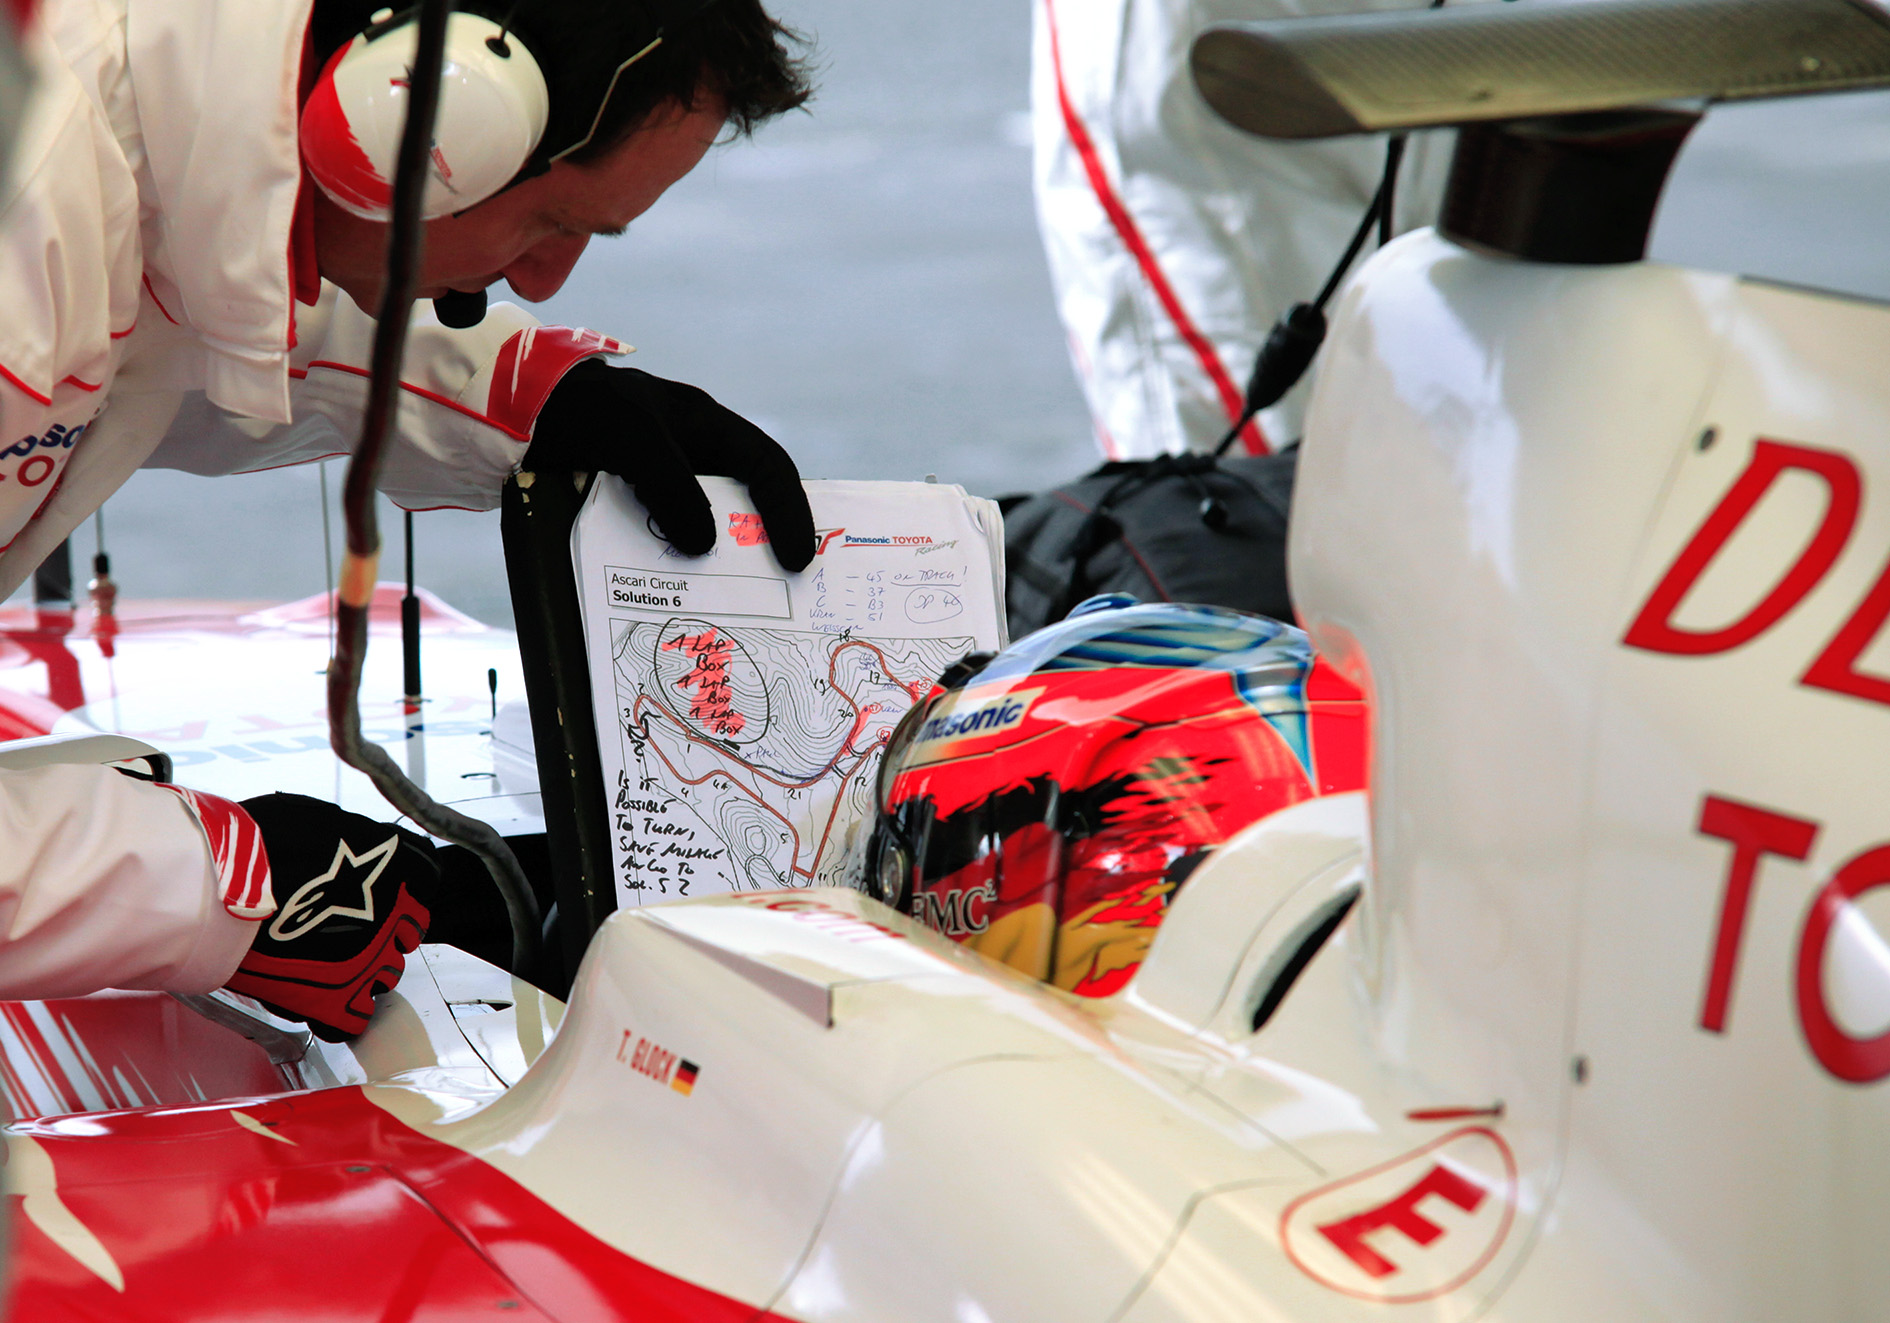 29_Josekdesign_Toyota_F1_Fotografie.jpg